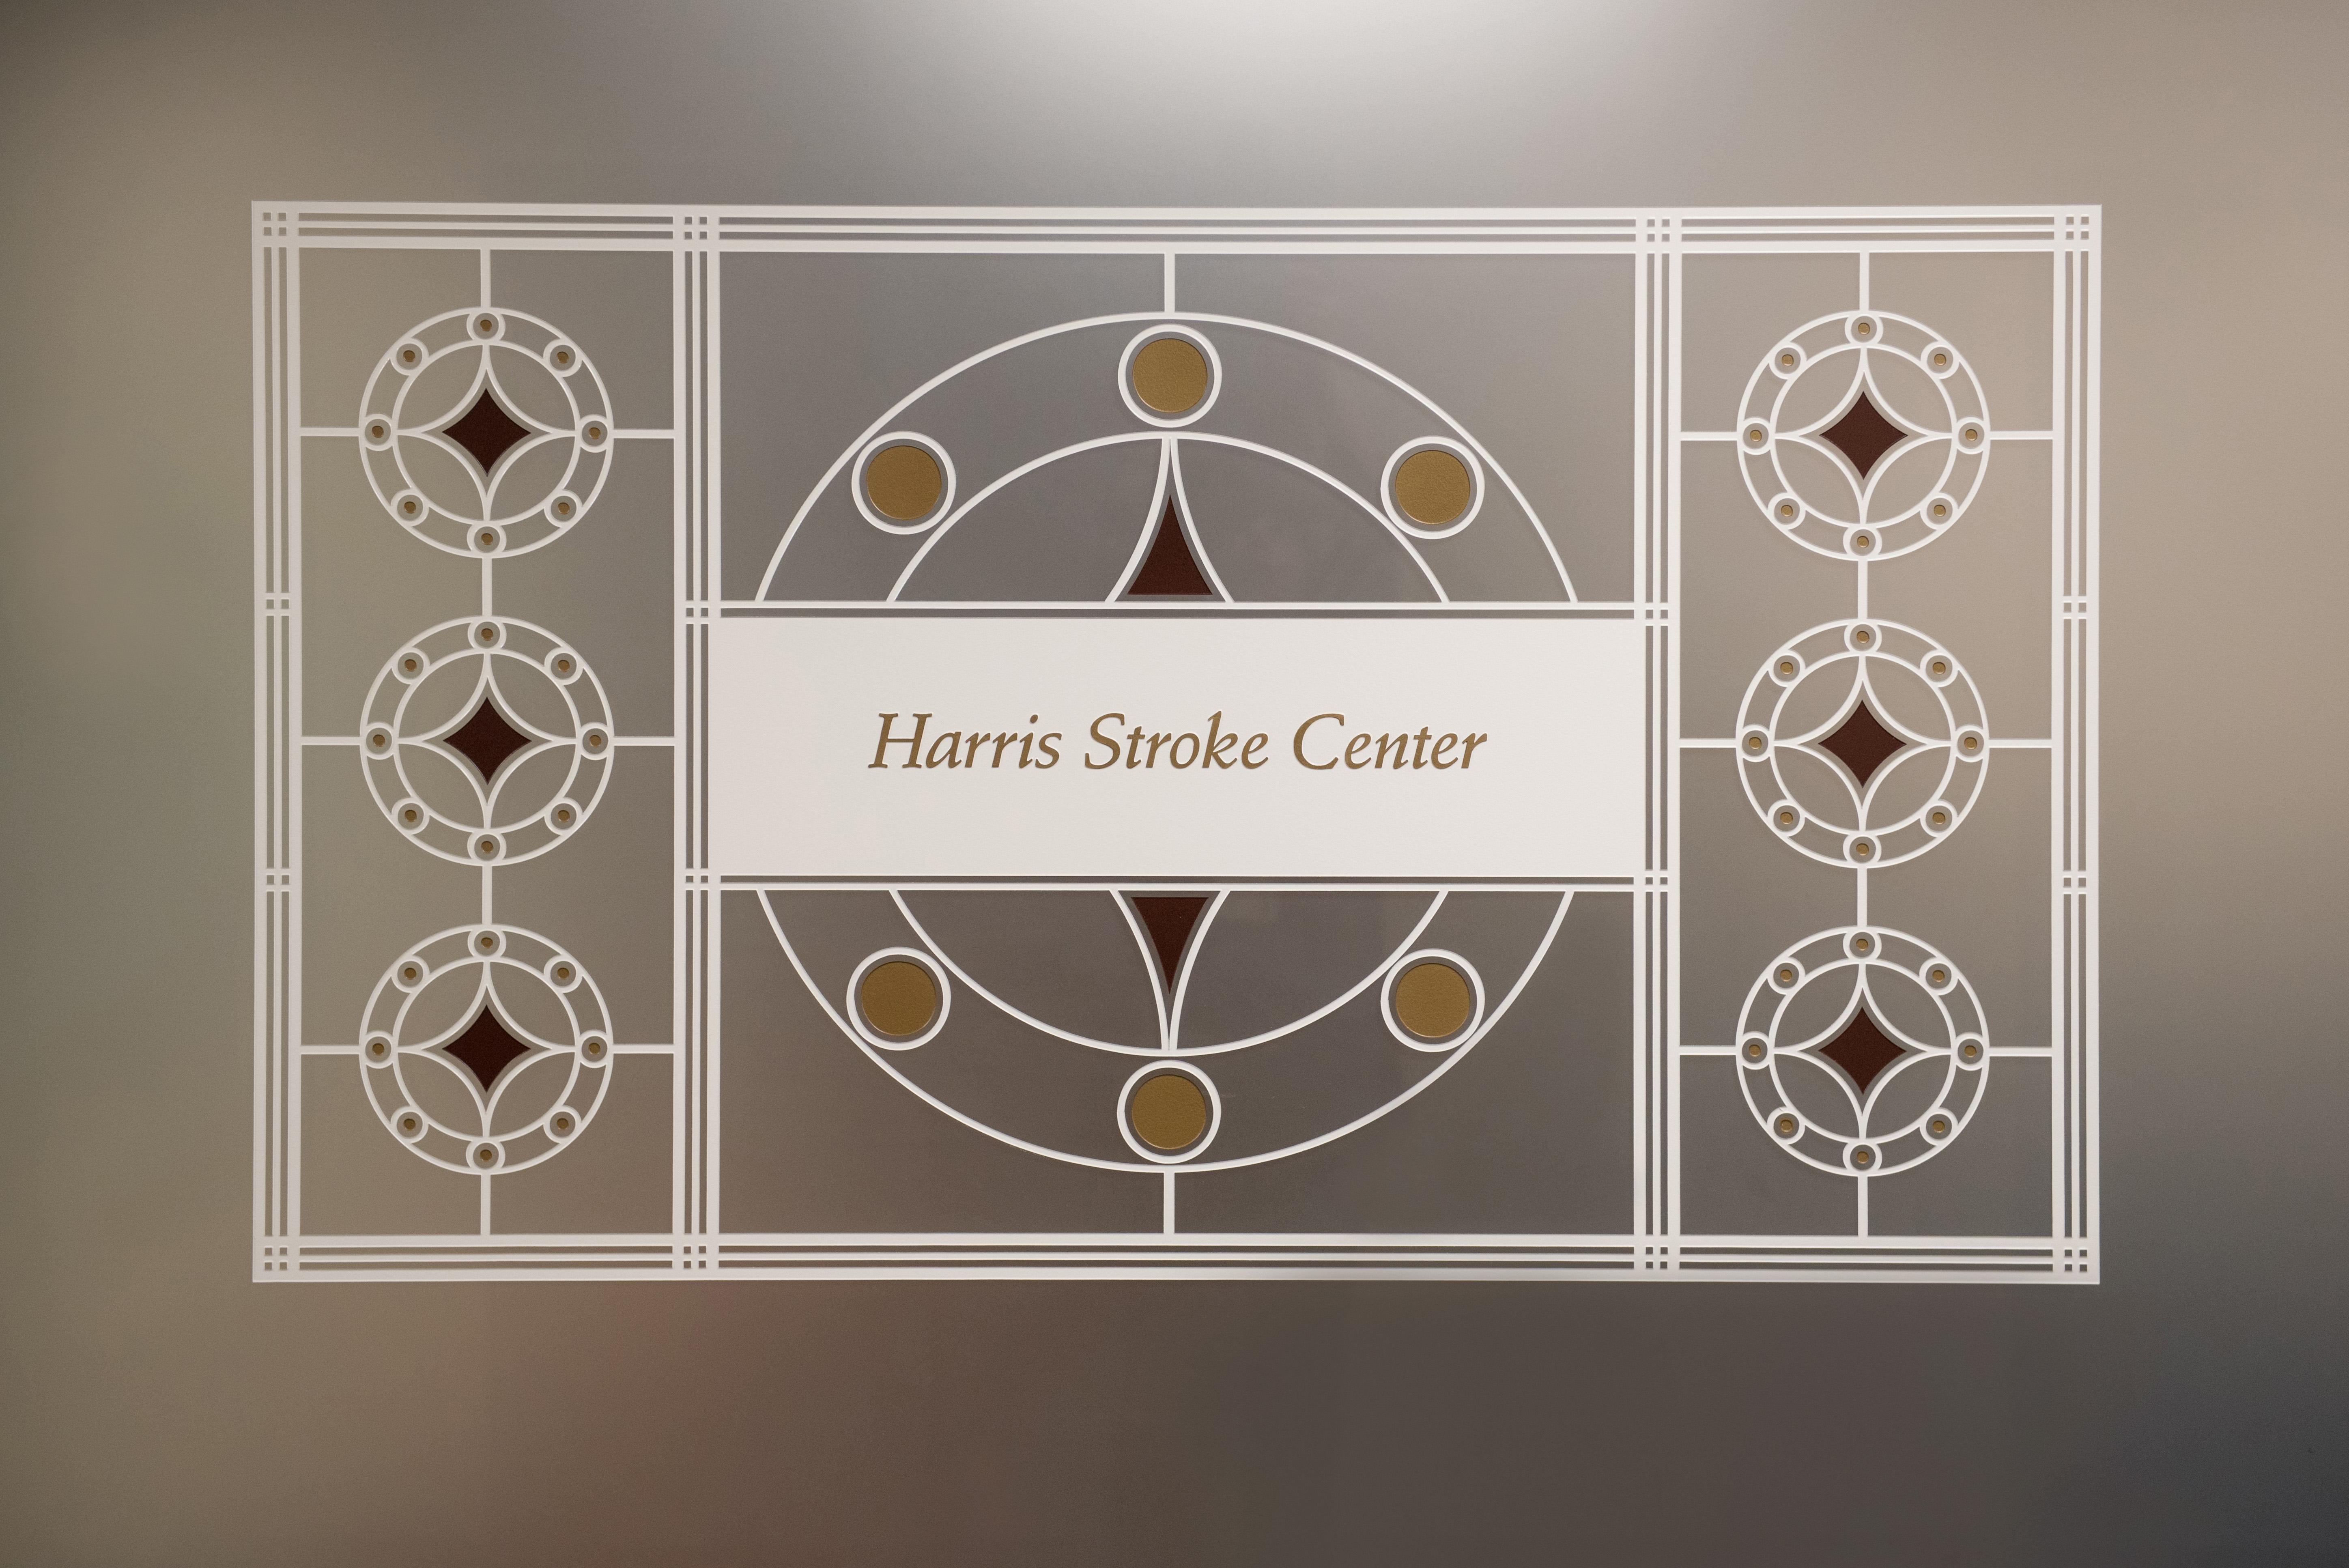 Henry Ford Health System's Harris Stroke Center